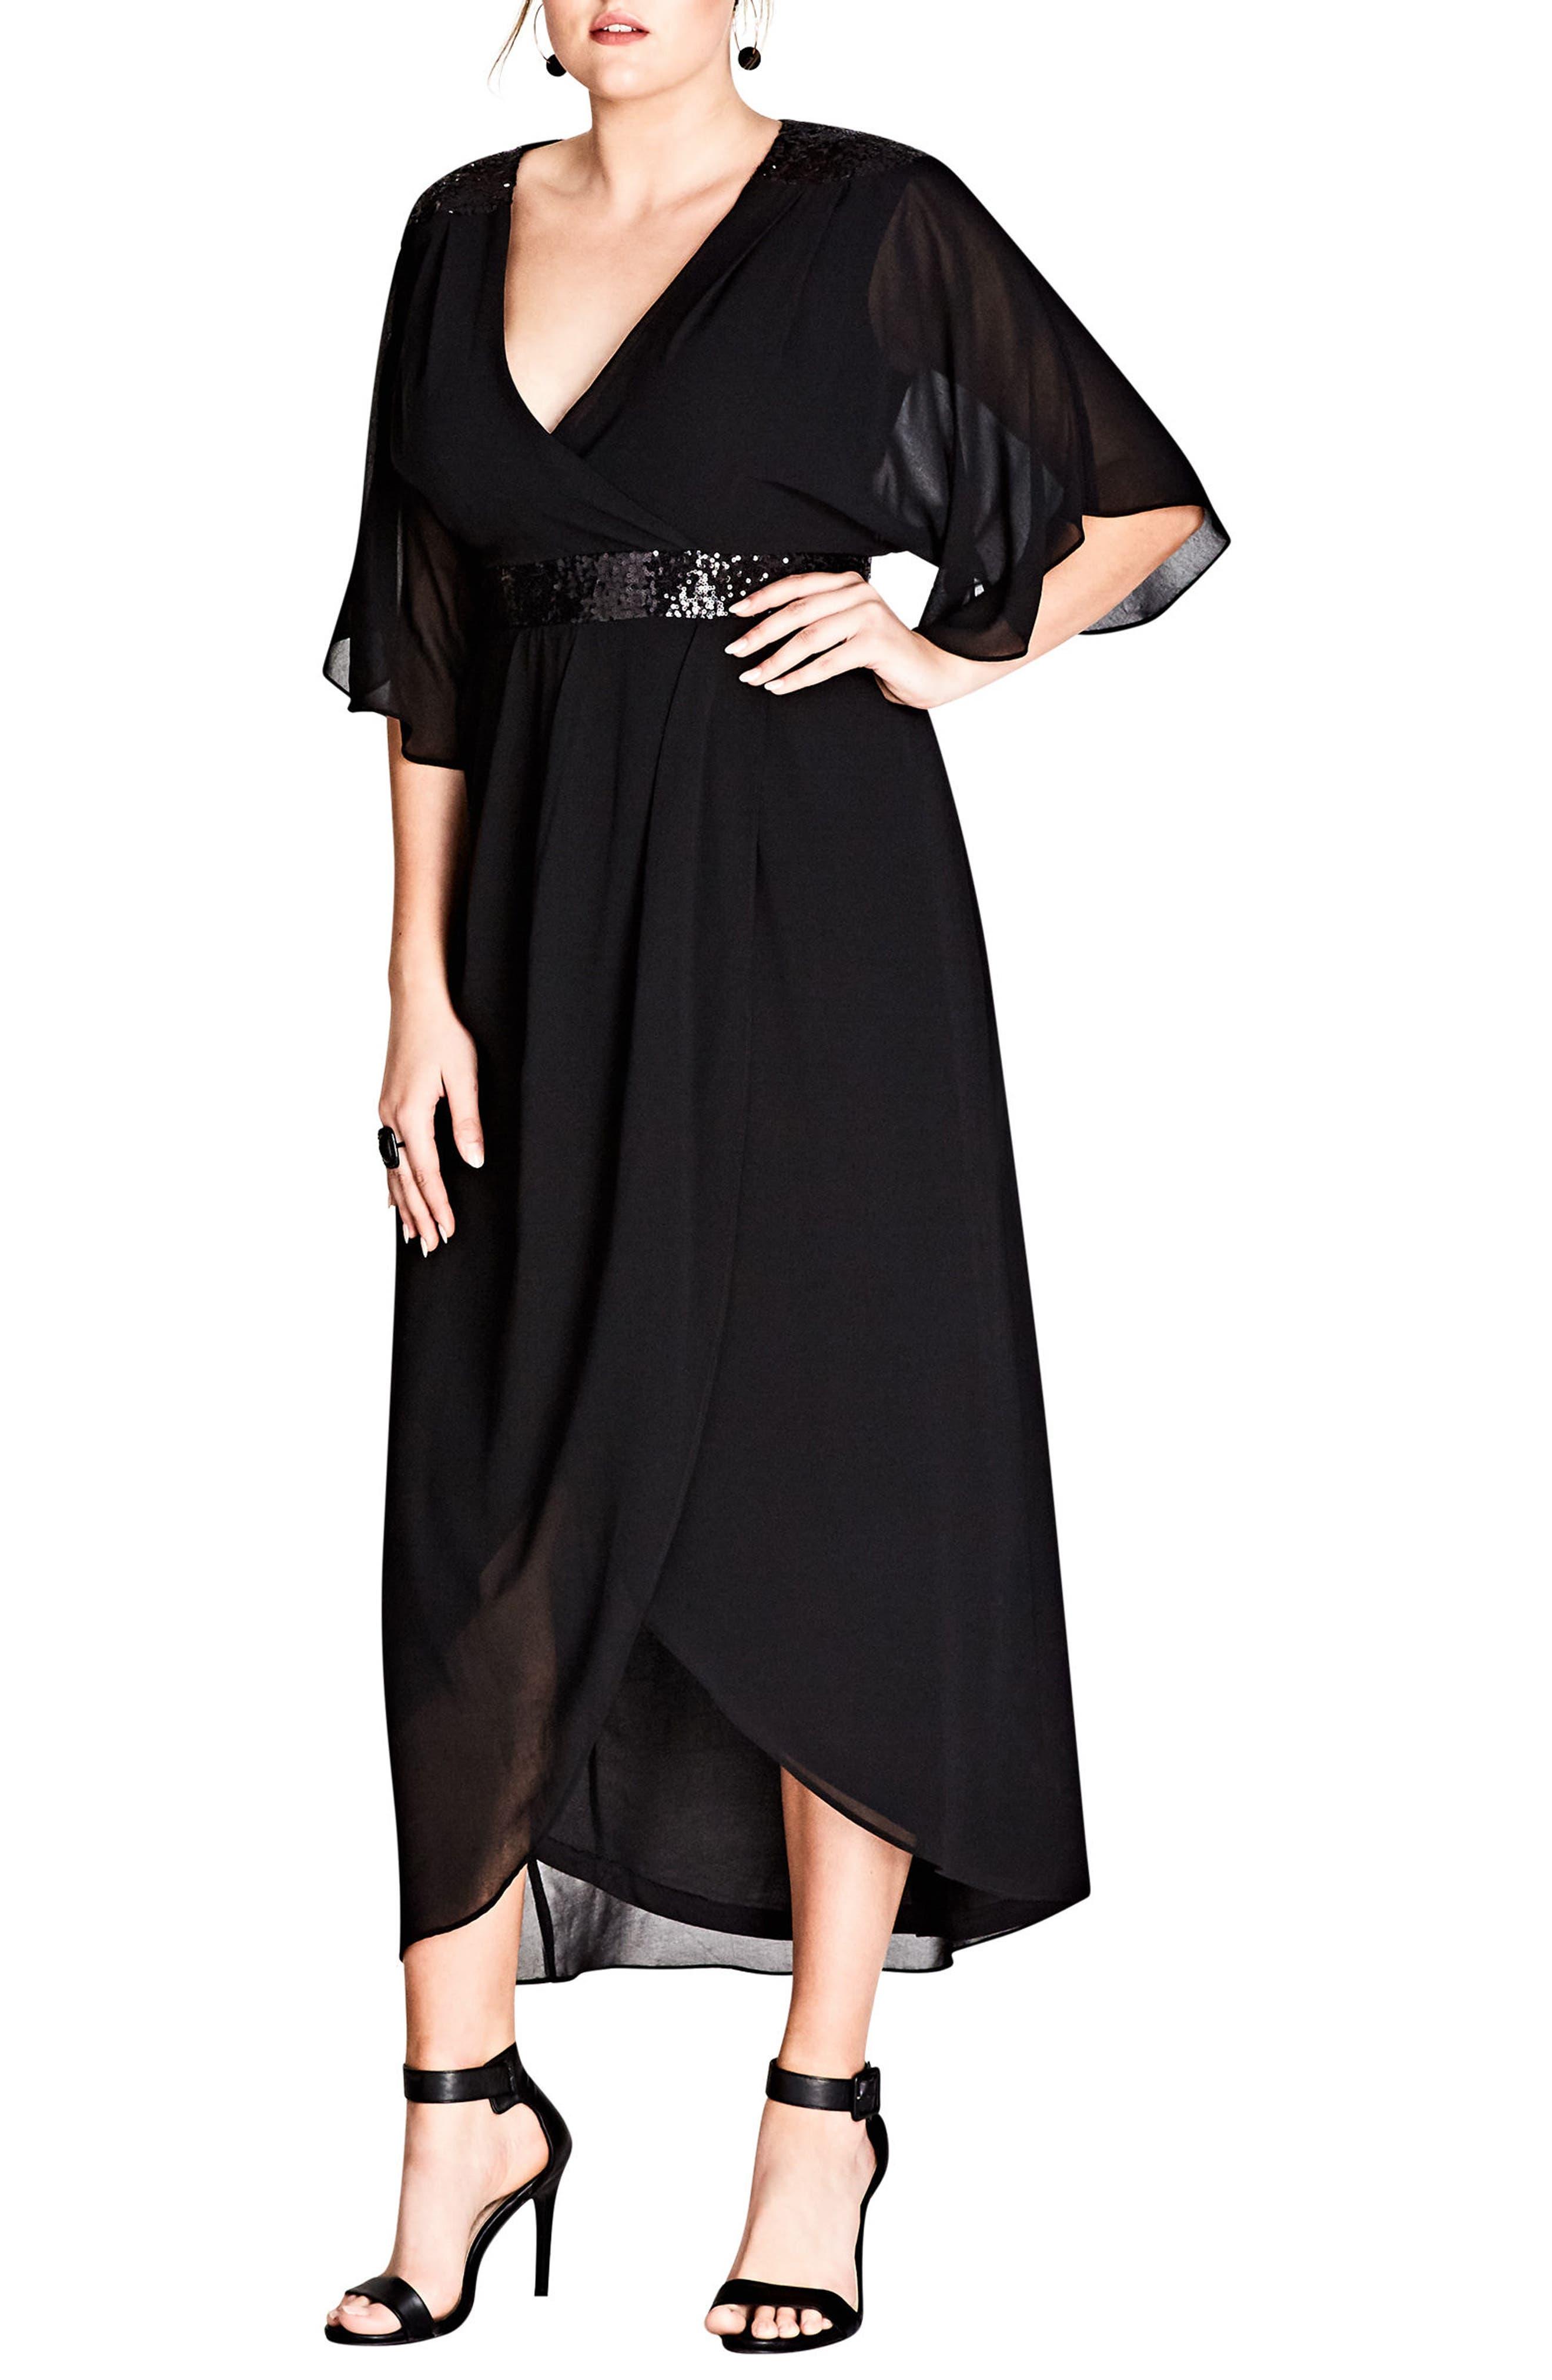 1960s – 70s Cocktail, Party, Prom, Evening Dresses Plus Size Womens City Chic Sequin Wrap Maxi Dress $119.00 AT vintagedancer.com